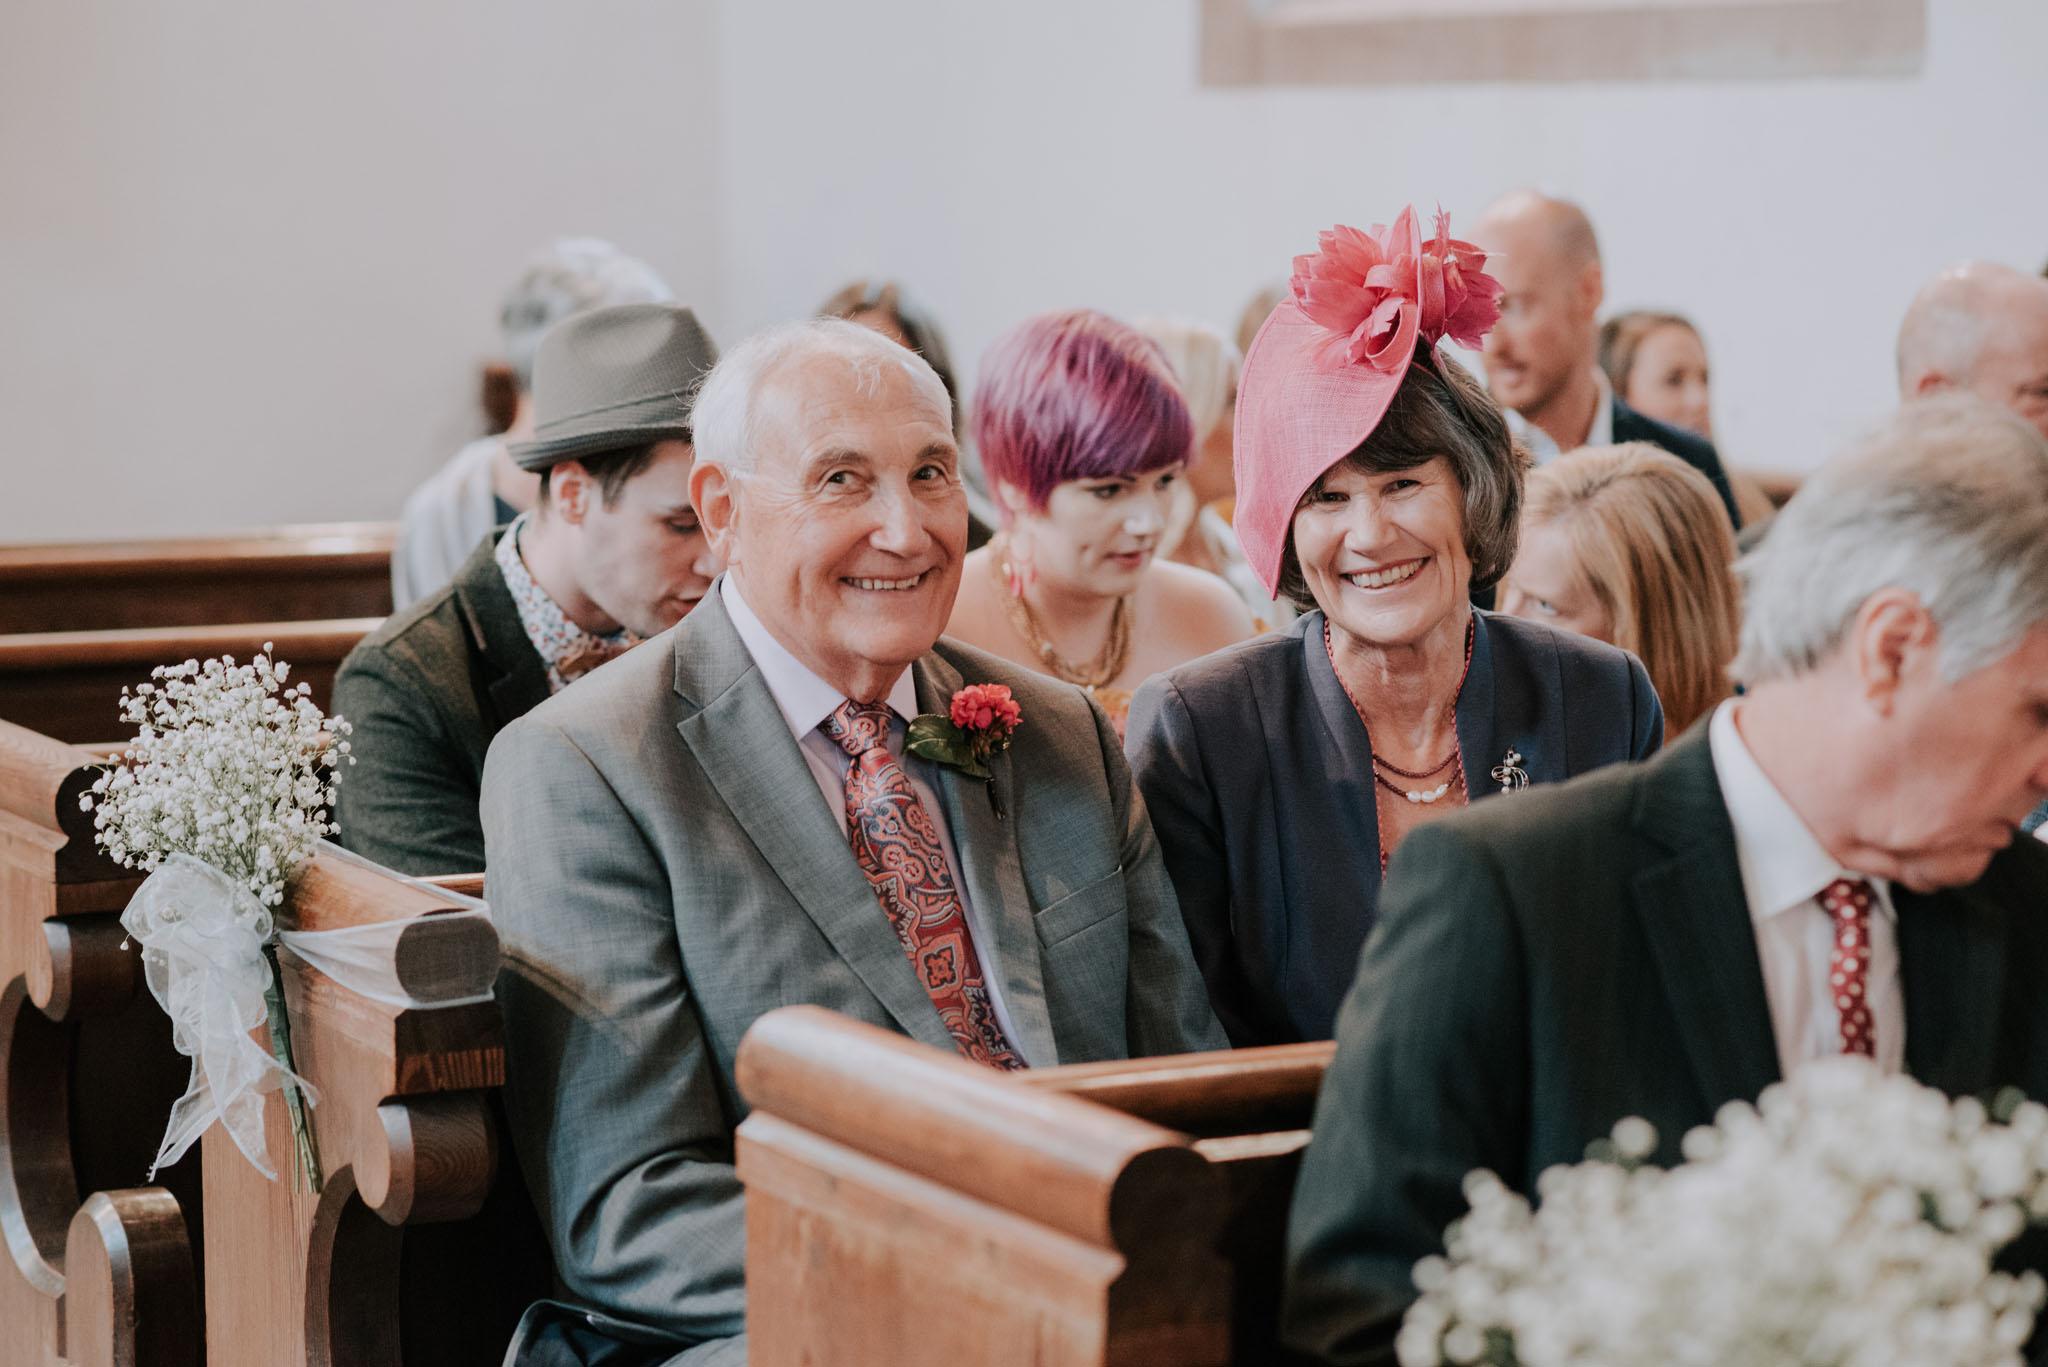 wedding-photographer-glewstone-court-hereford-scott-stockwell-photography207.jpg